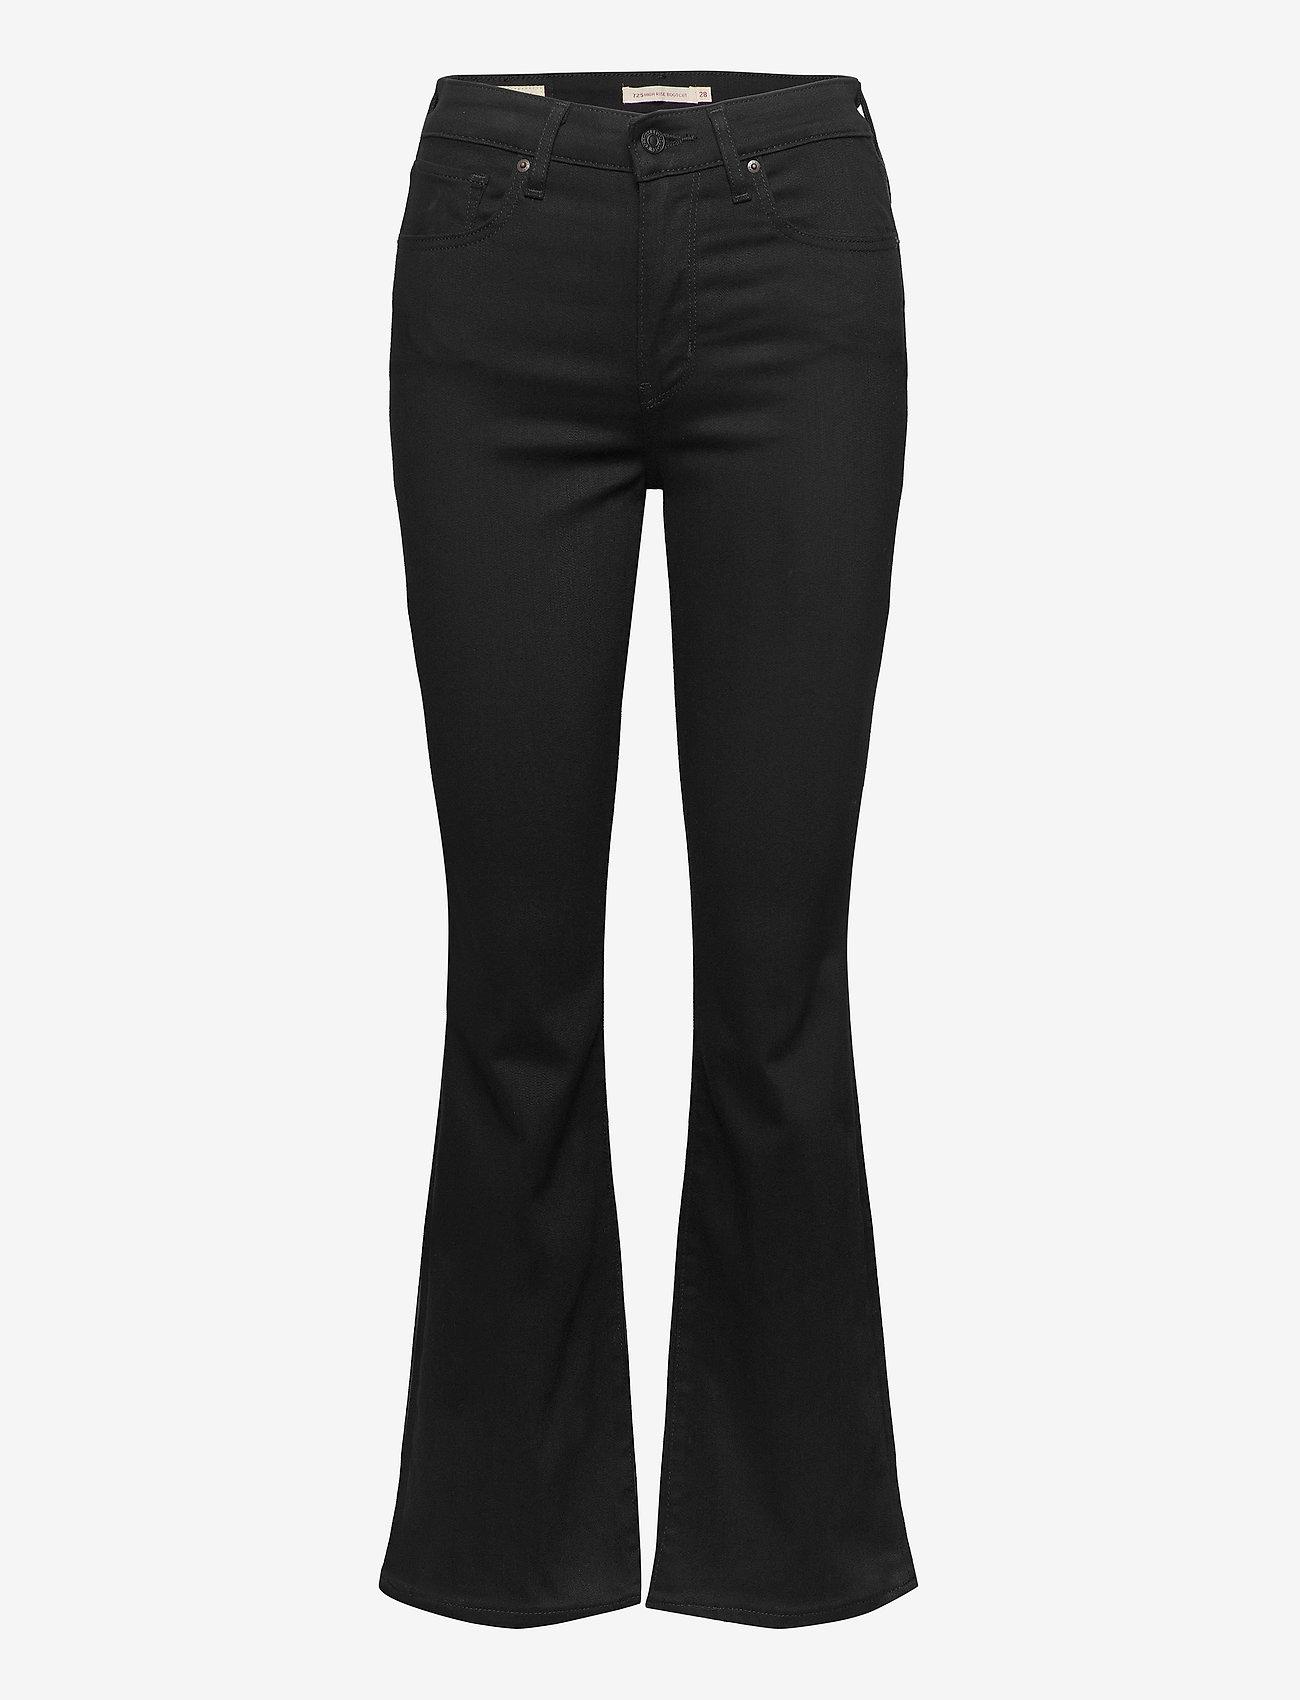 LEVI´S Women - 725 HIGH RISE BOOTCUT NIGHT IS - schlaghosen - blacks - 1